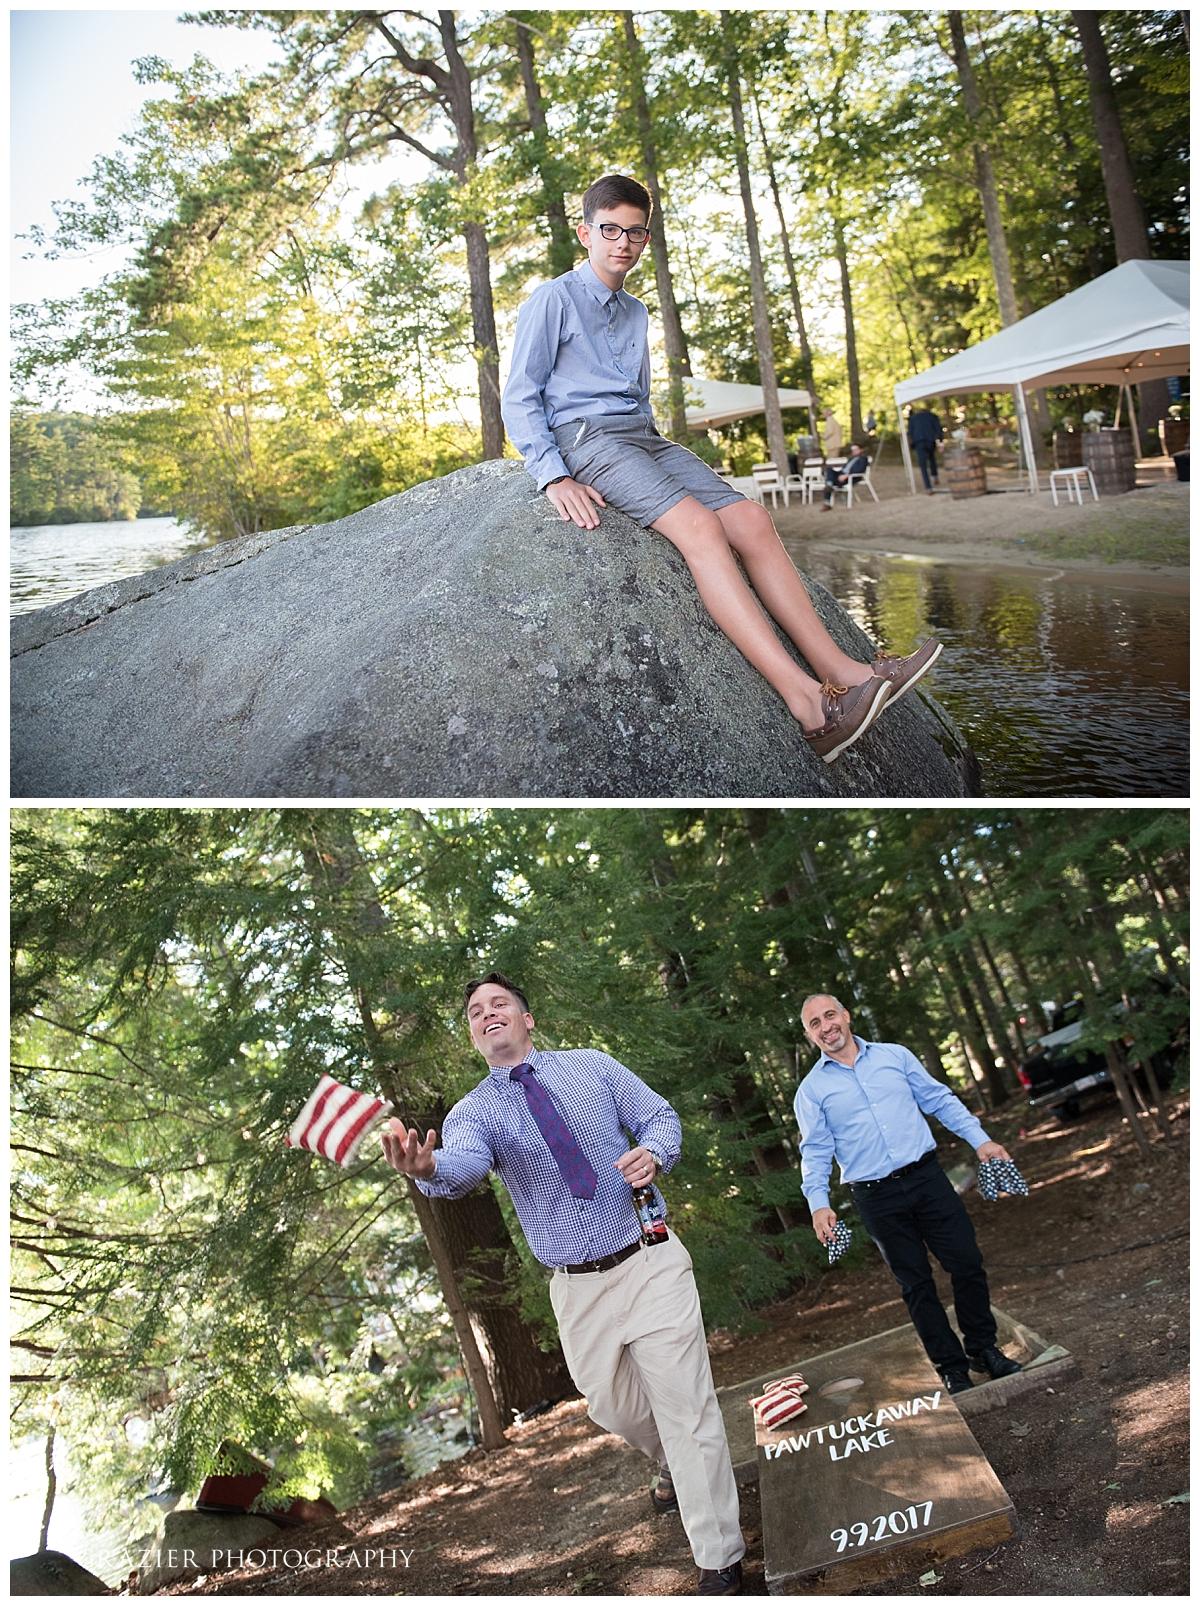 New Hampshire Lake Wedding Grazier Photography 170909-184_WEB.jpg